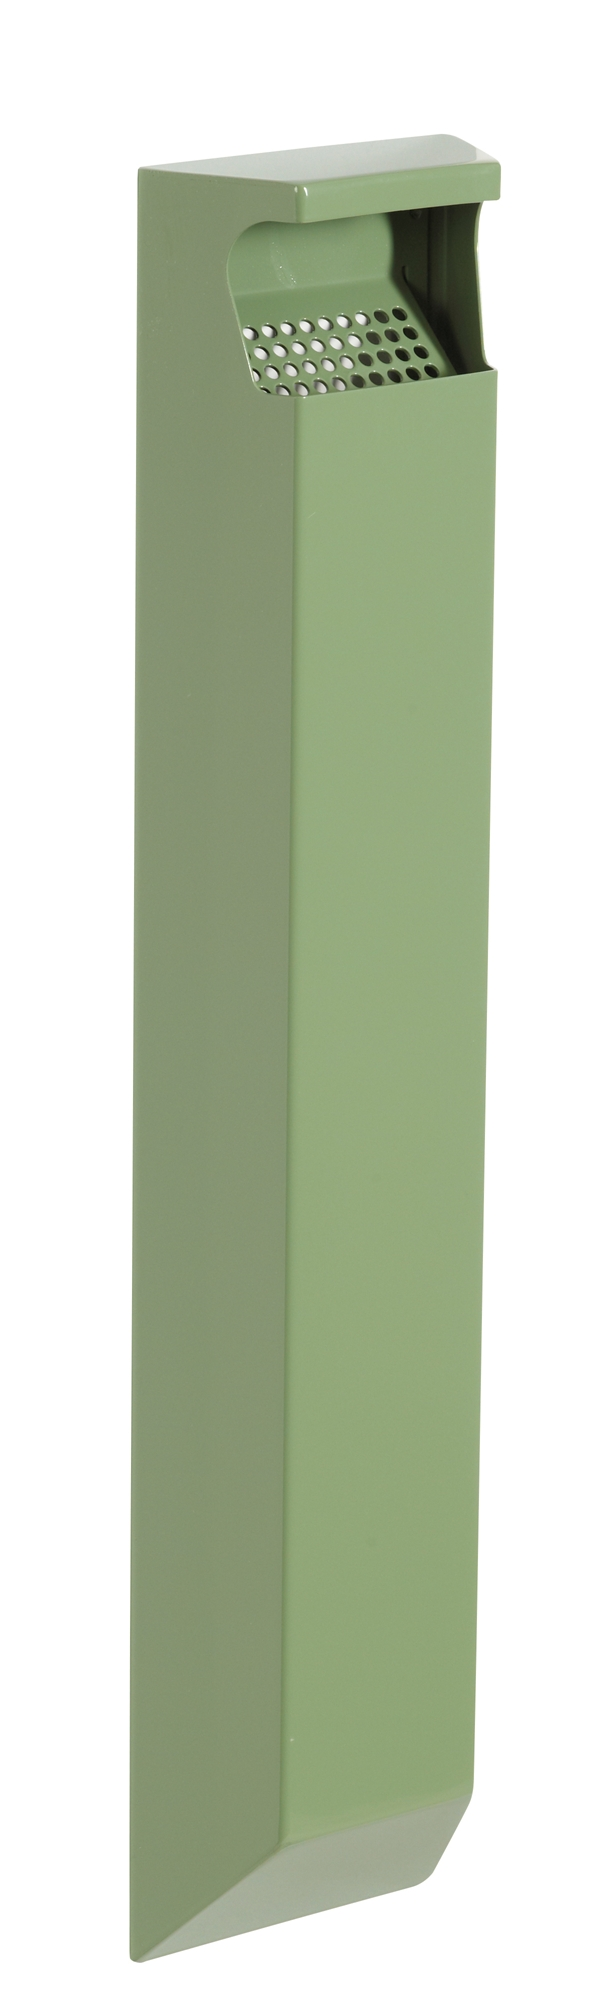 Cendrier exterieur rossignol mural 3l vert reseda for Cendrier mural rossignol